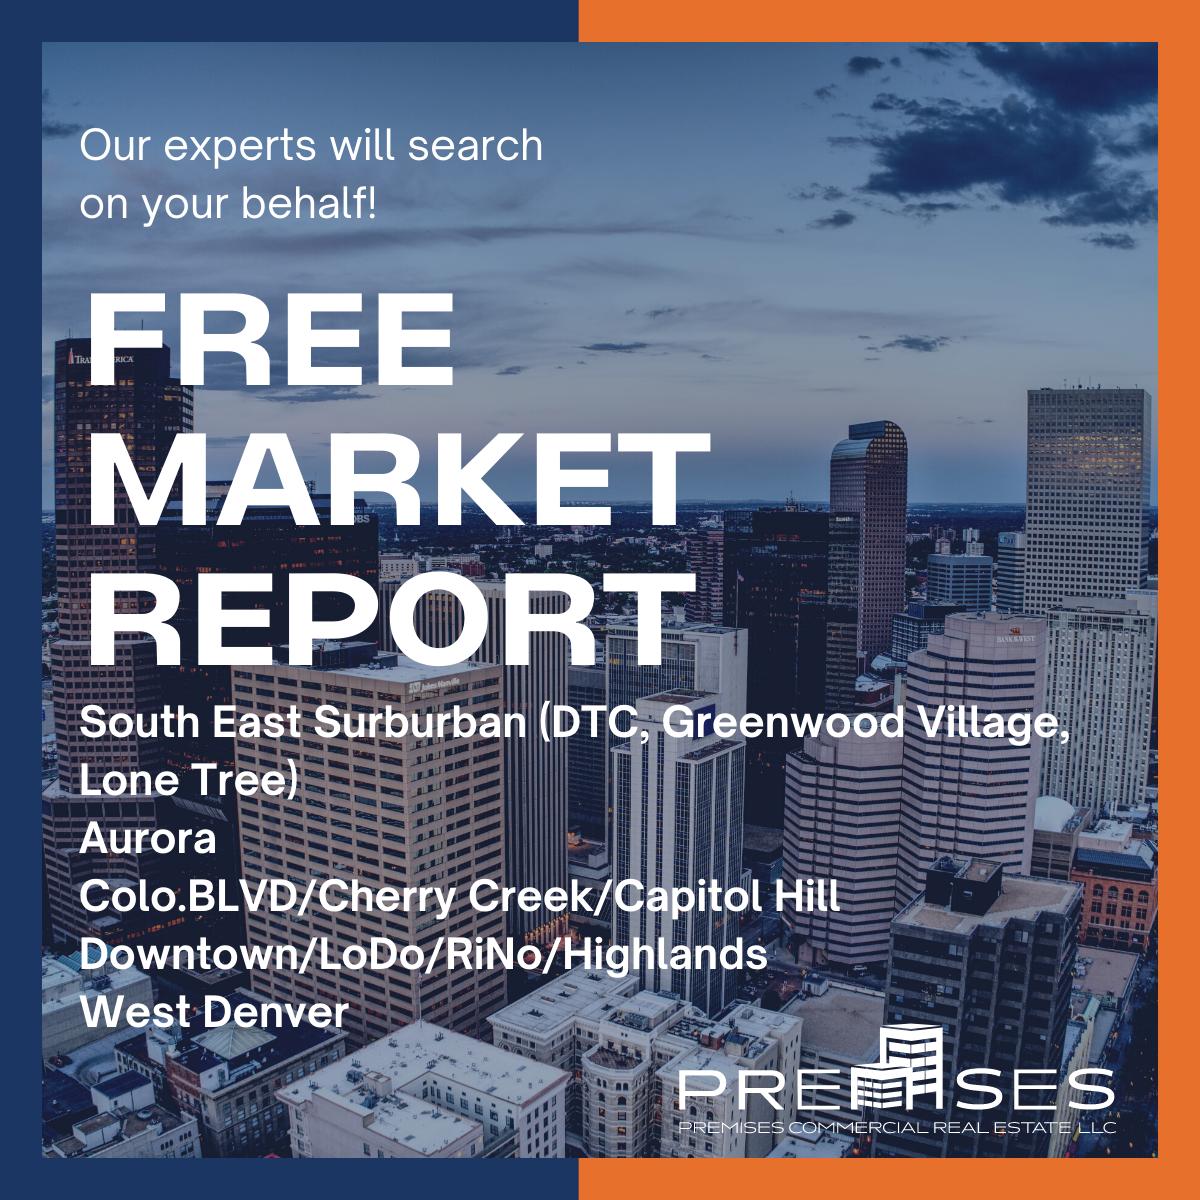 Free Market Report